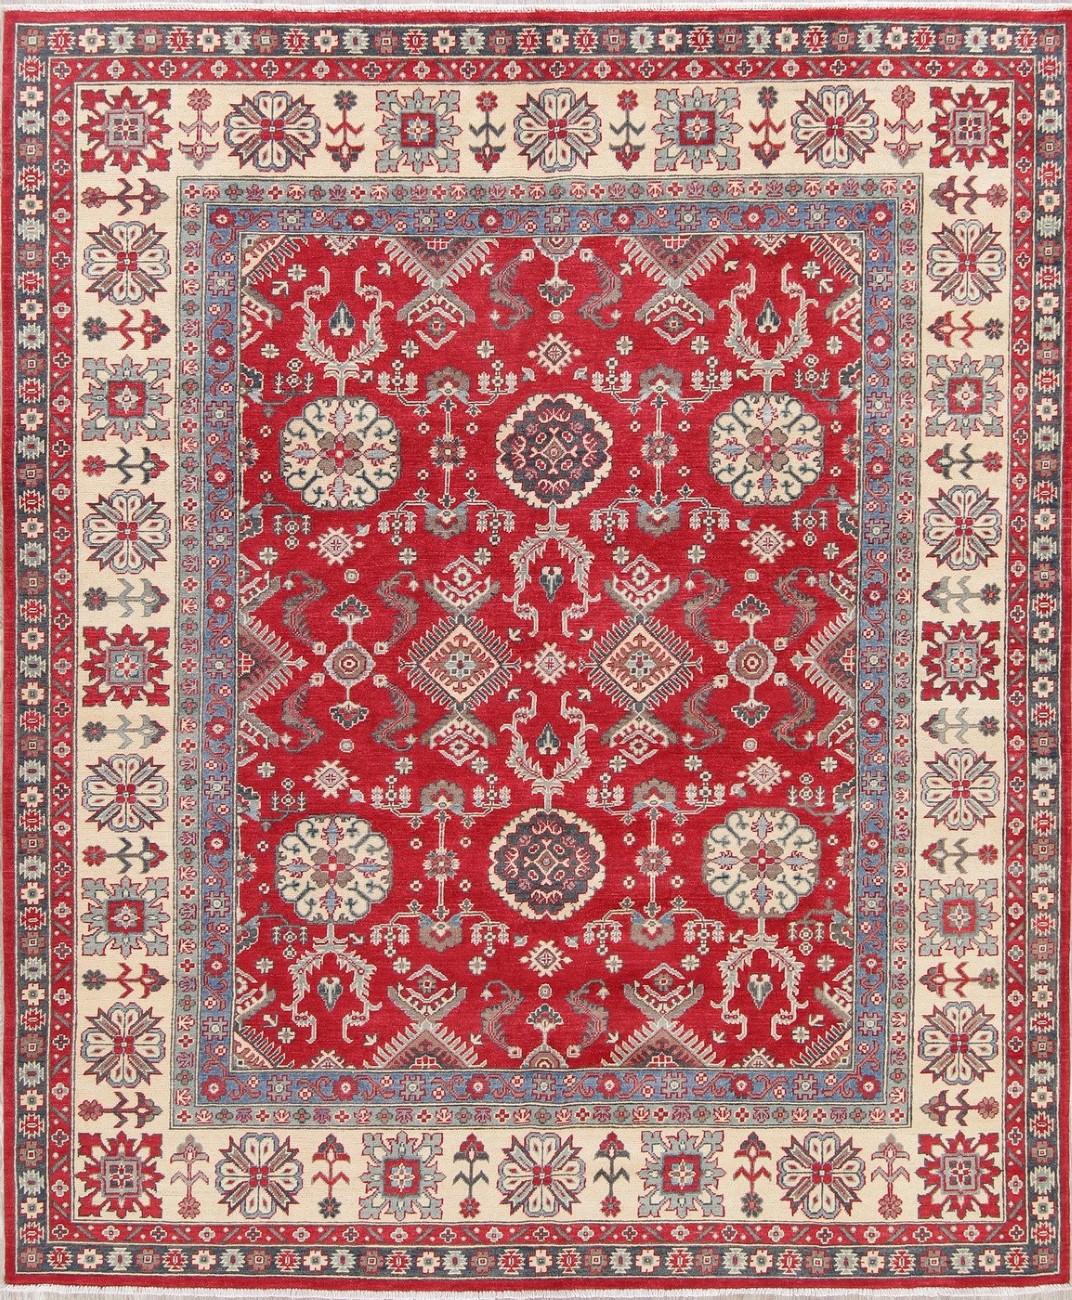 Breathtaking Large Geometric Red 10x12 Bakhtiari Persian: 8'x10' Red And Ivory NEW Kazak Hand-Knotted Geometric